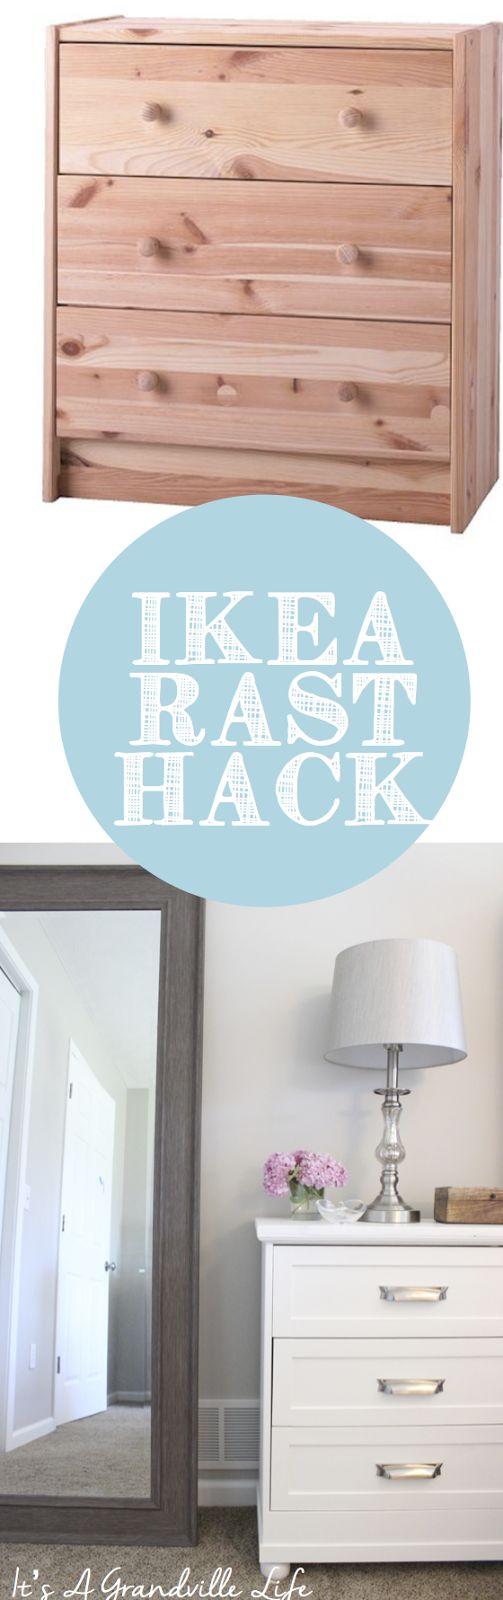 896 best diy images on pinterest diy projects and wood. Black Bedroom Furniture Sets. Home Design Ideas